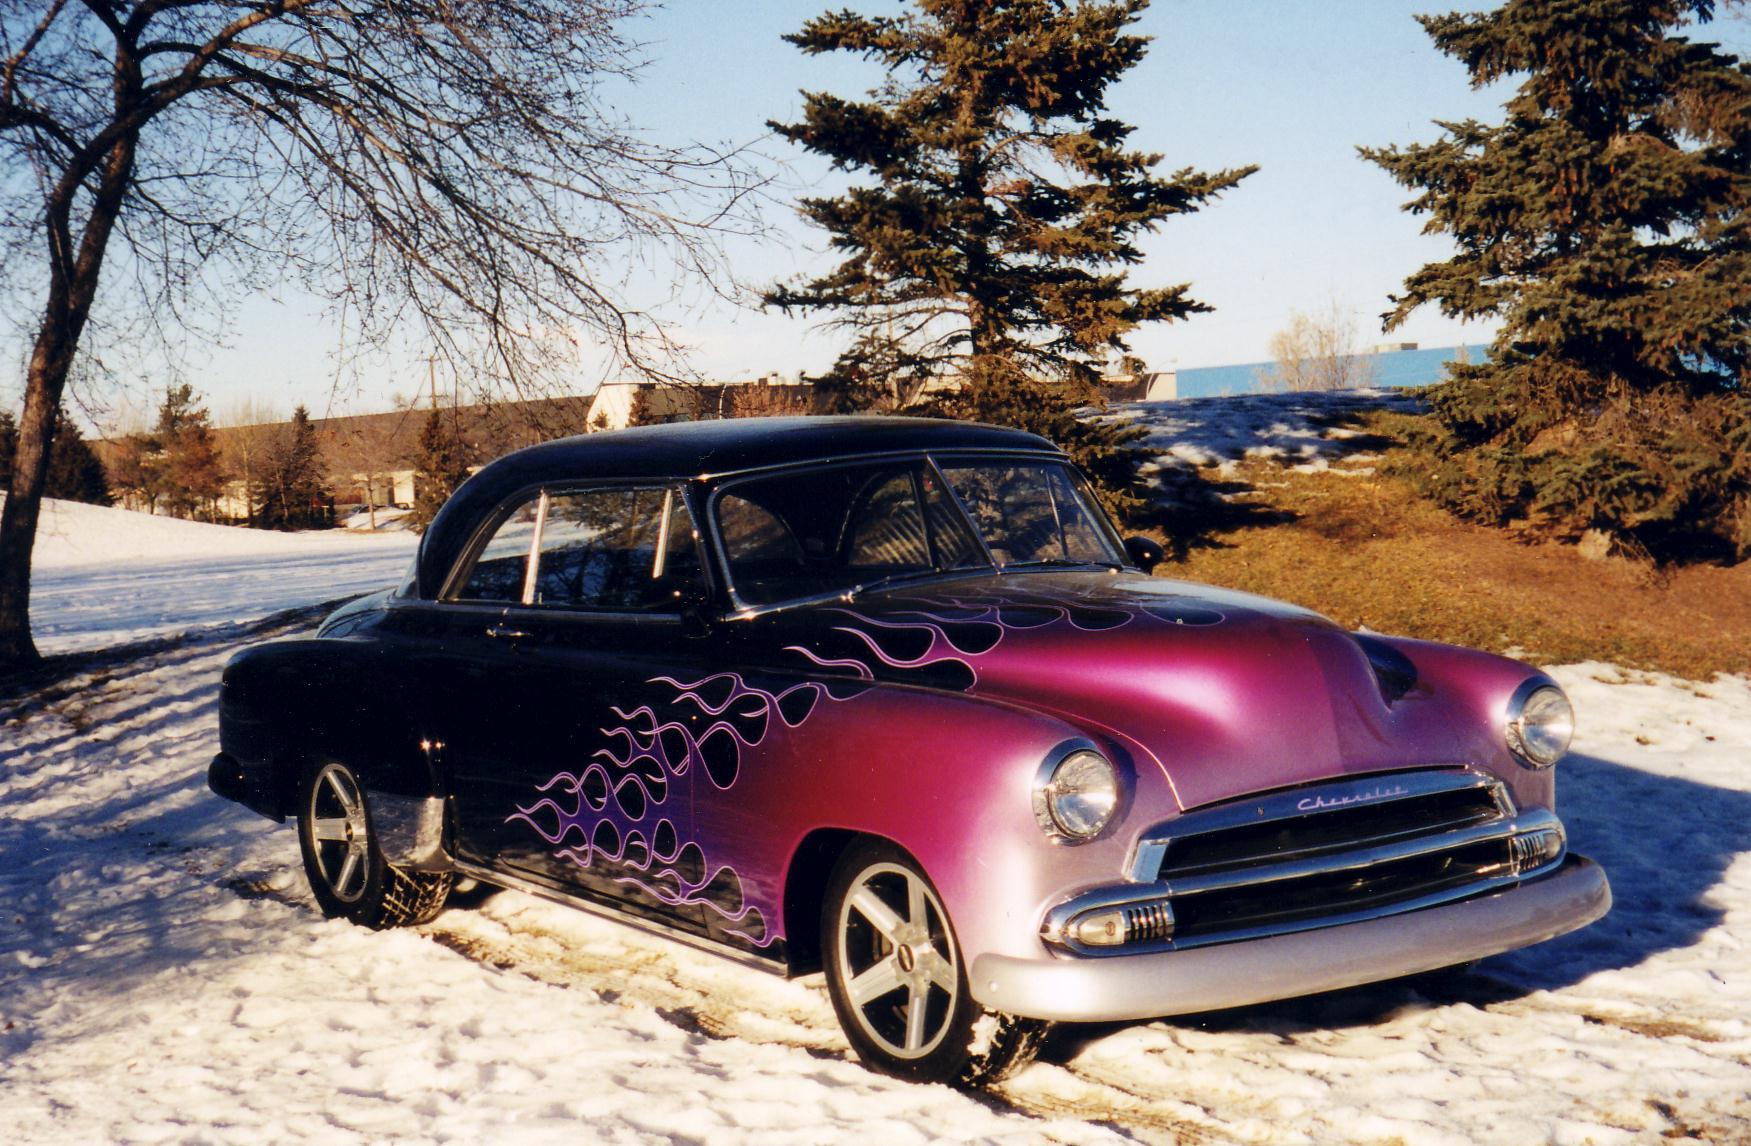 1951 Chevrolet Pernise